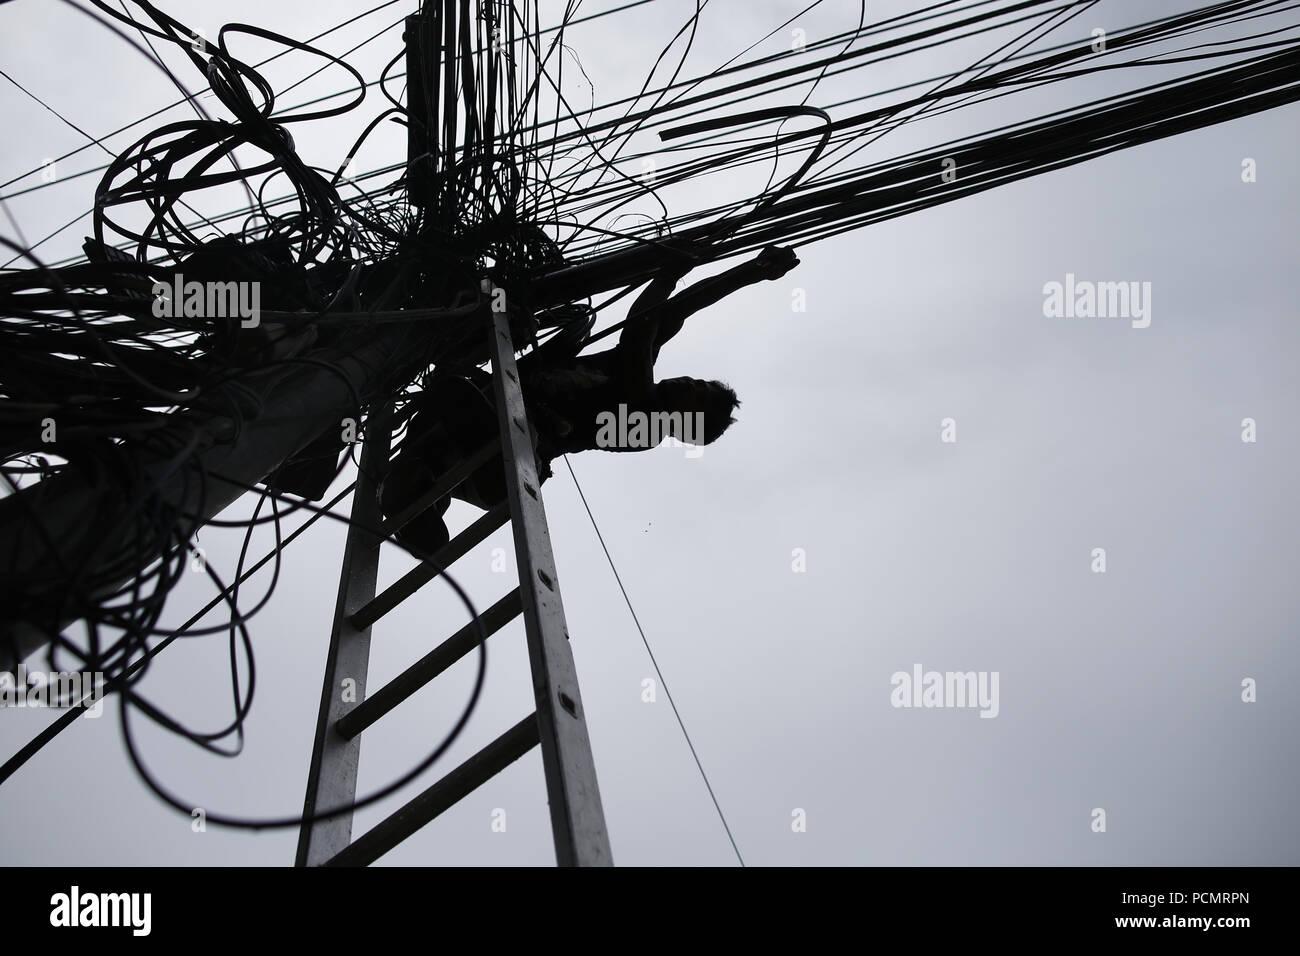 August 3, 2018 - Kathmandu, Nepal - An electrician fi ... on